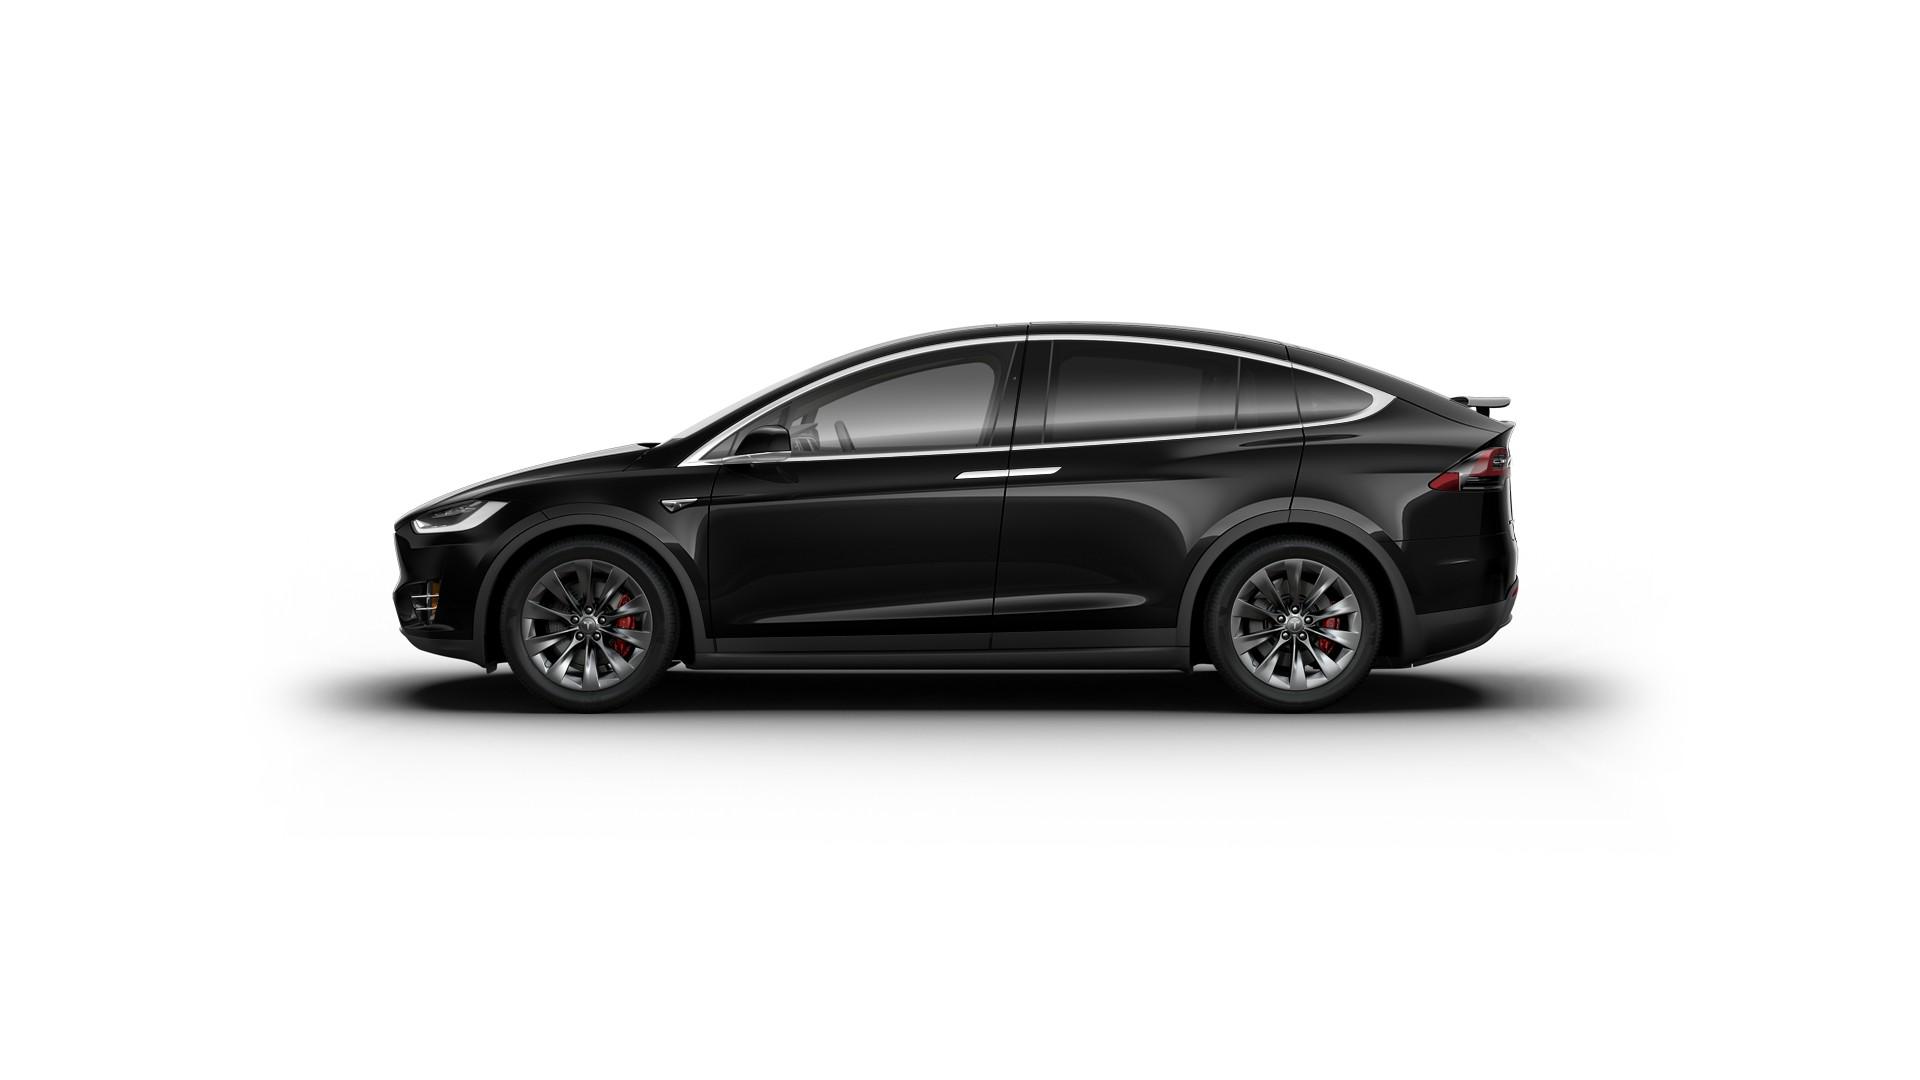 2017 Tesla Model X P100d Obsidian Black Metallic Paint Vin